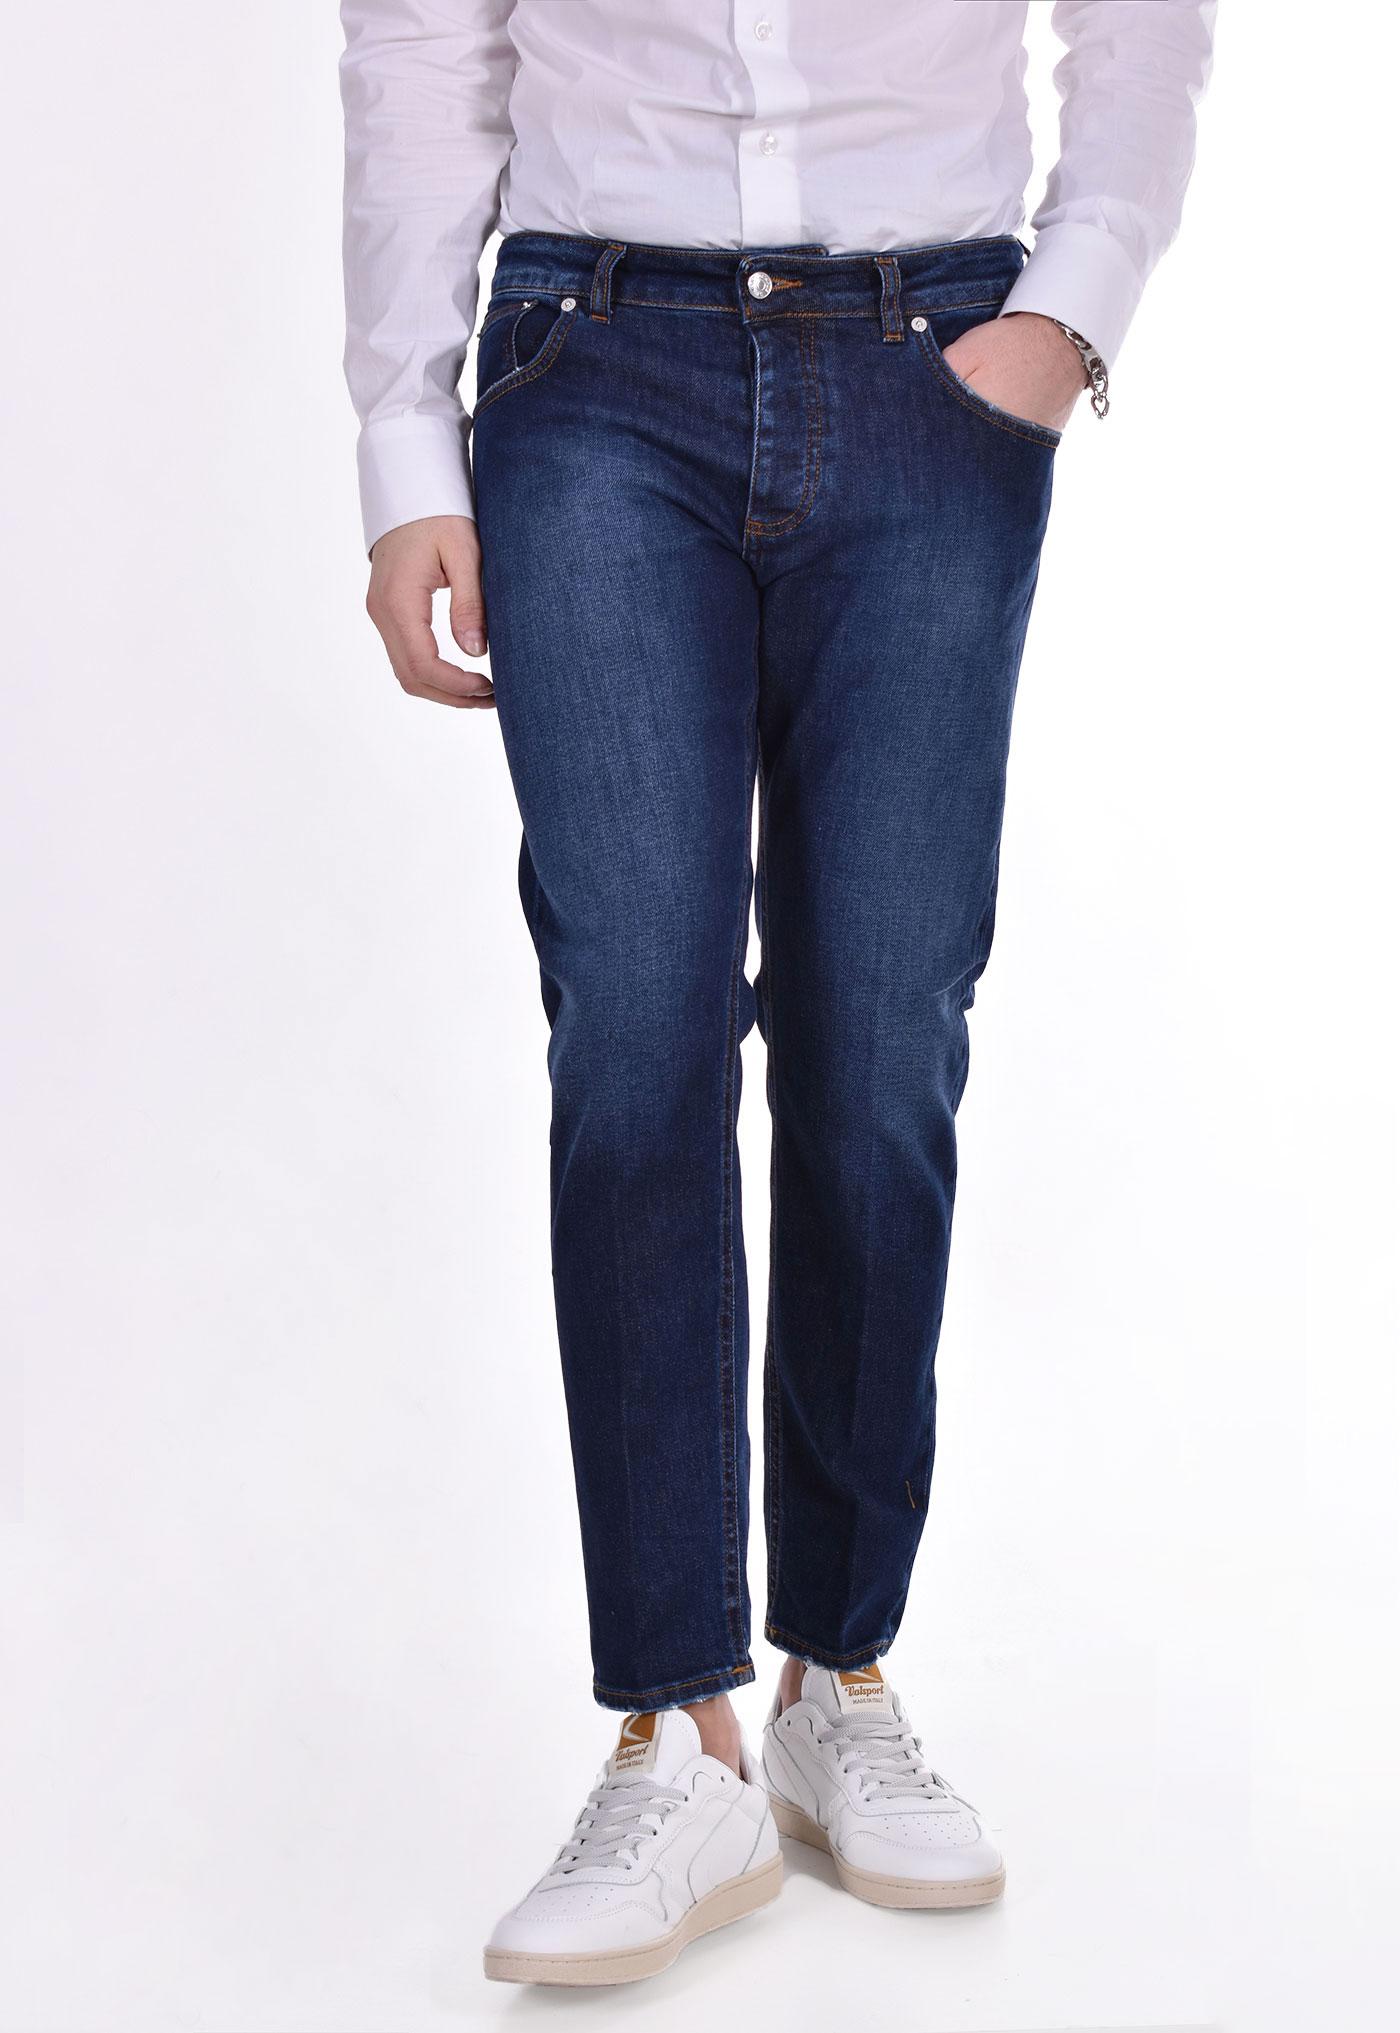 Jeans Be Able Davis Shorter gkc BE ABLE | GKC1400